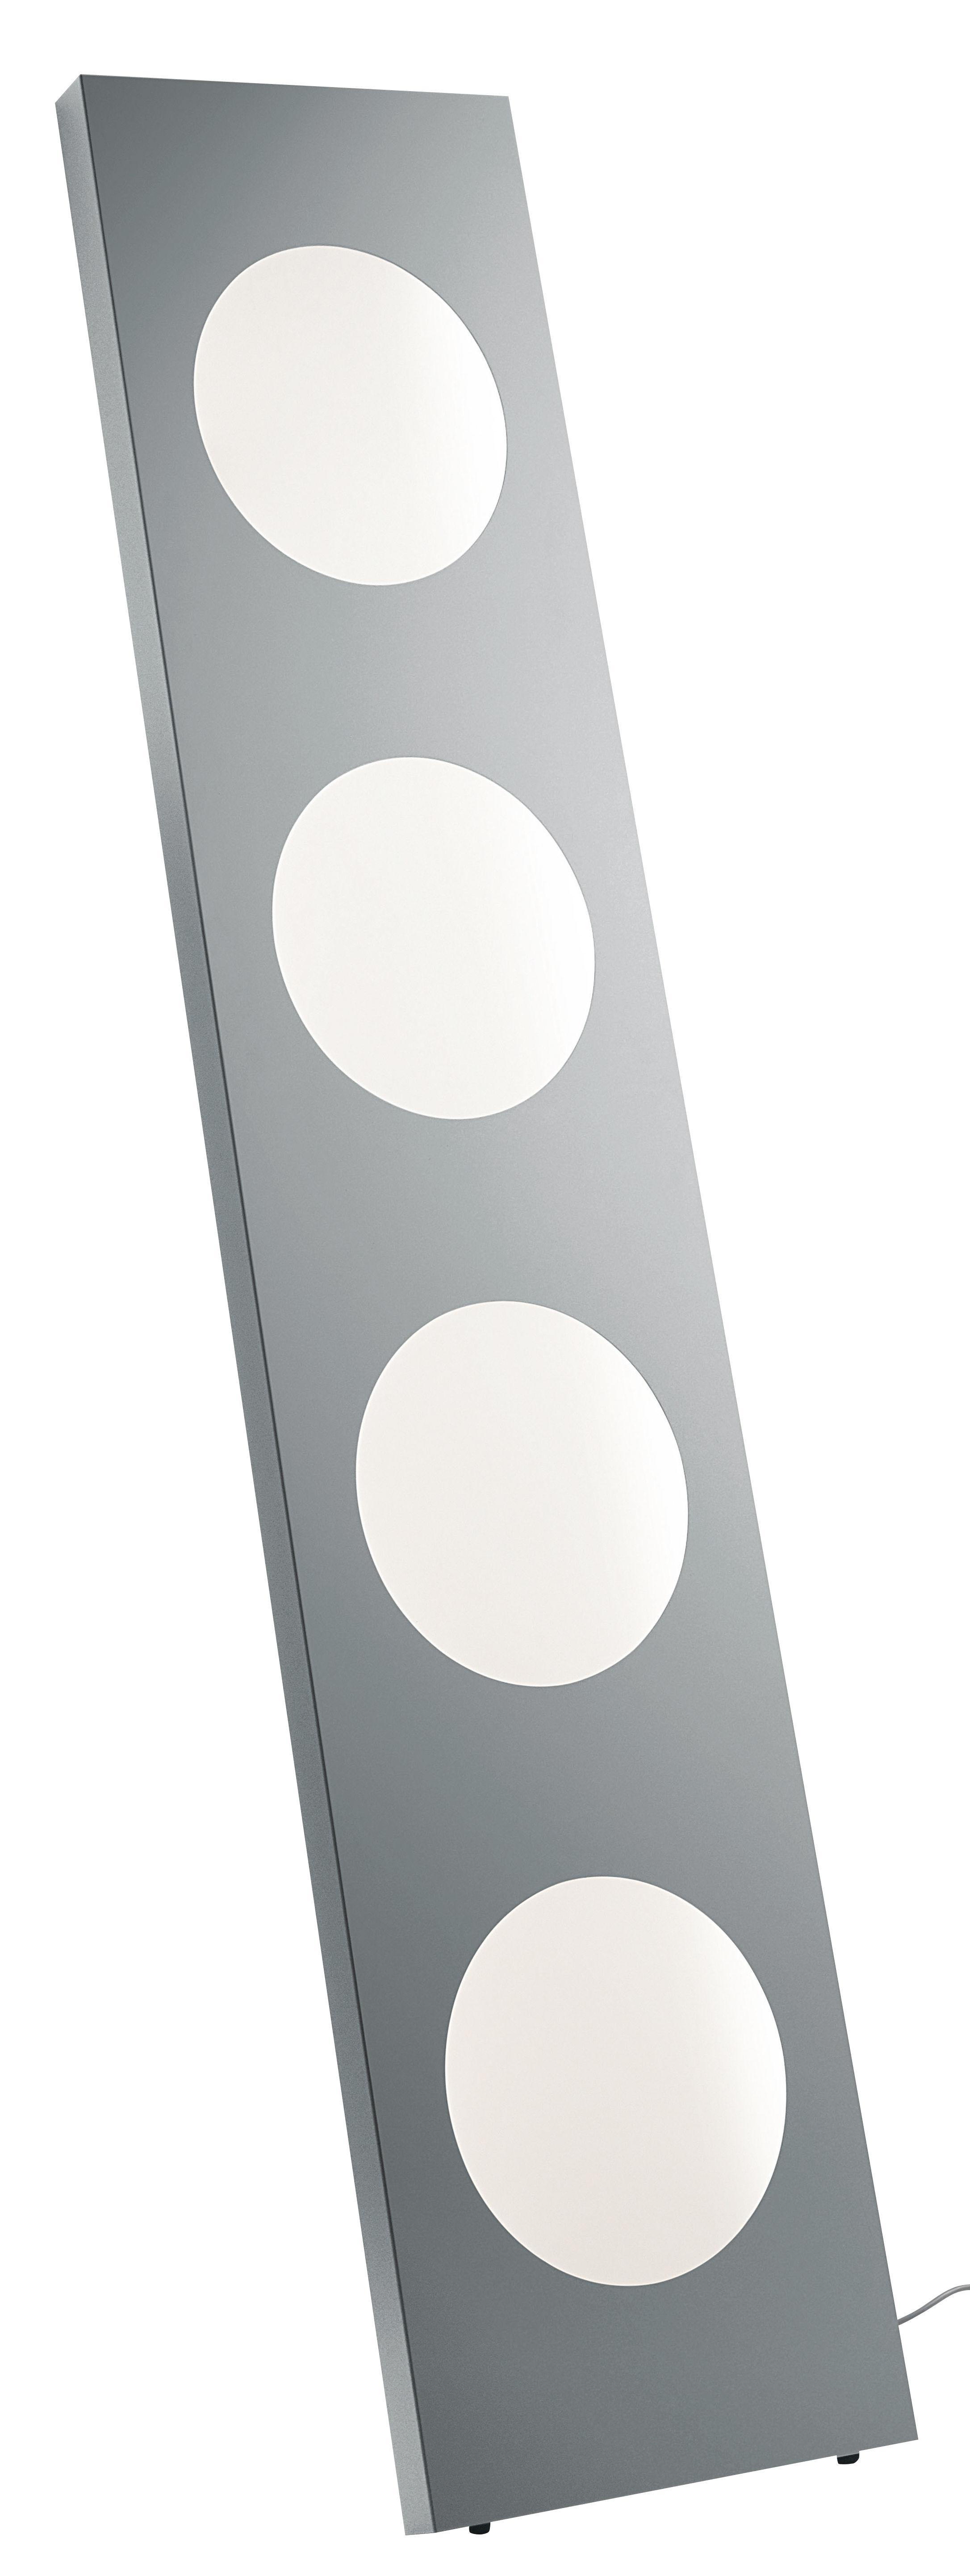 Luminaire - Lampadaires - Lampadaire Dolmen LED / L 40 x H 180 cm - Foscarini - Aluminium - Aluminiu anodisé, PMMA